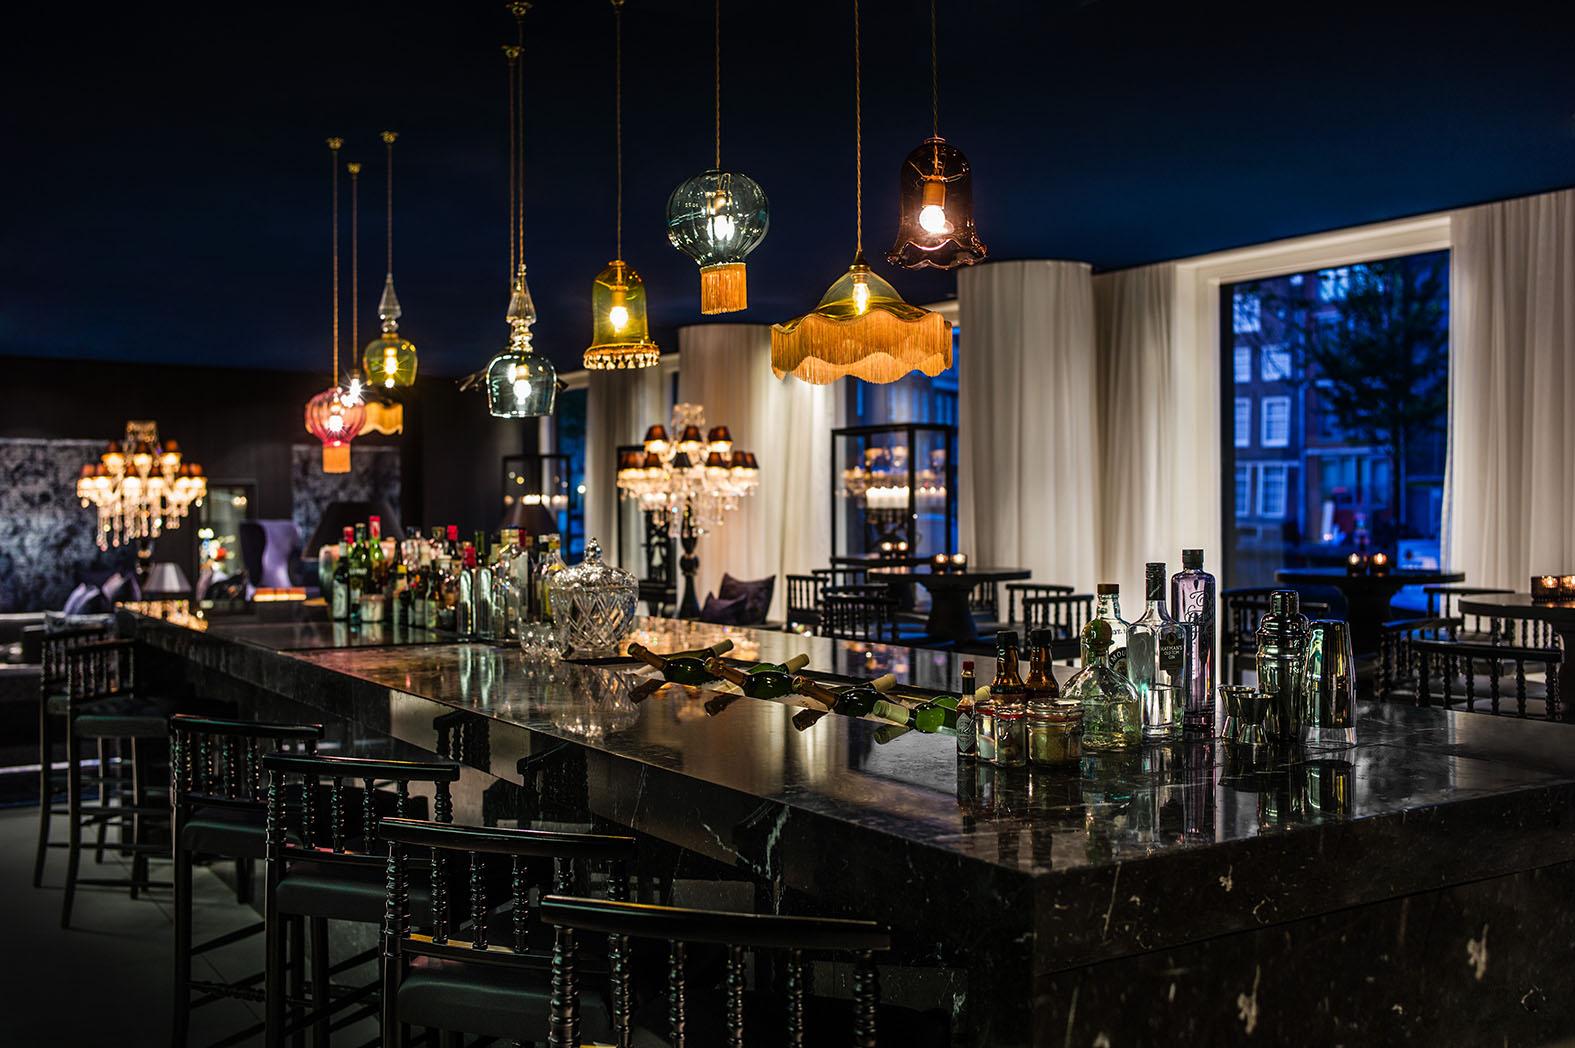 Restaurants Archieven Amsterdam Canal District